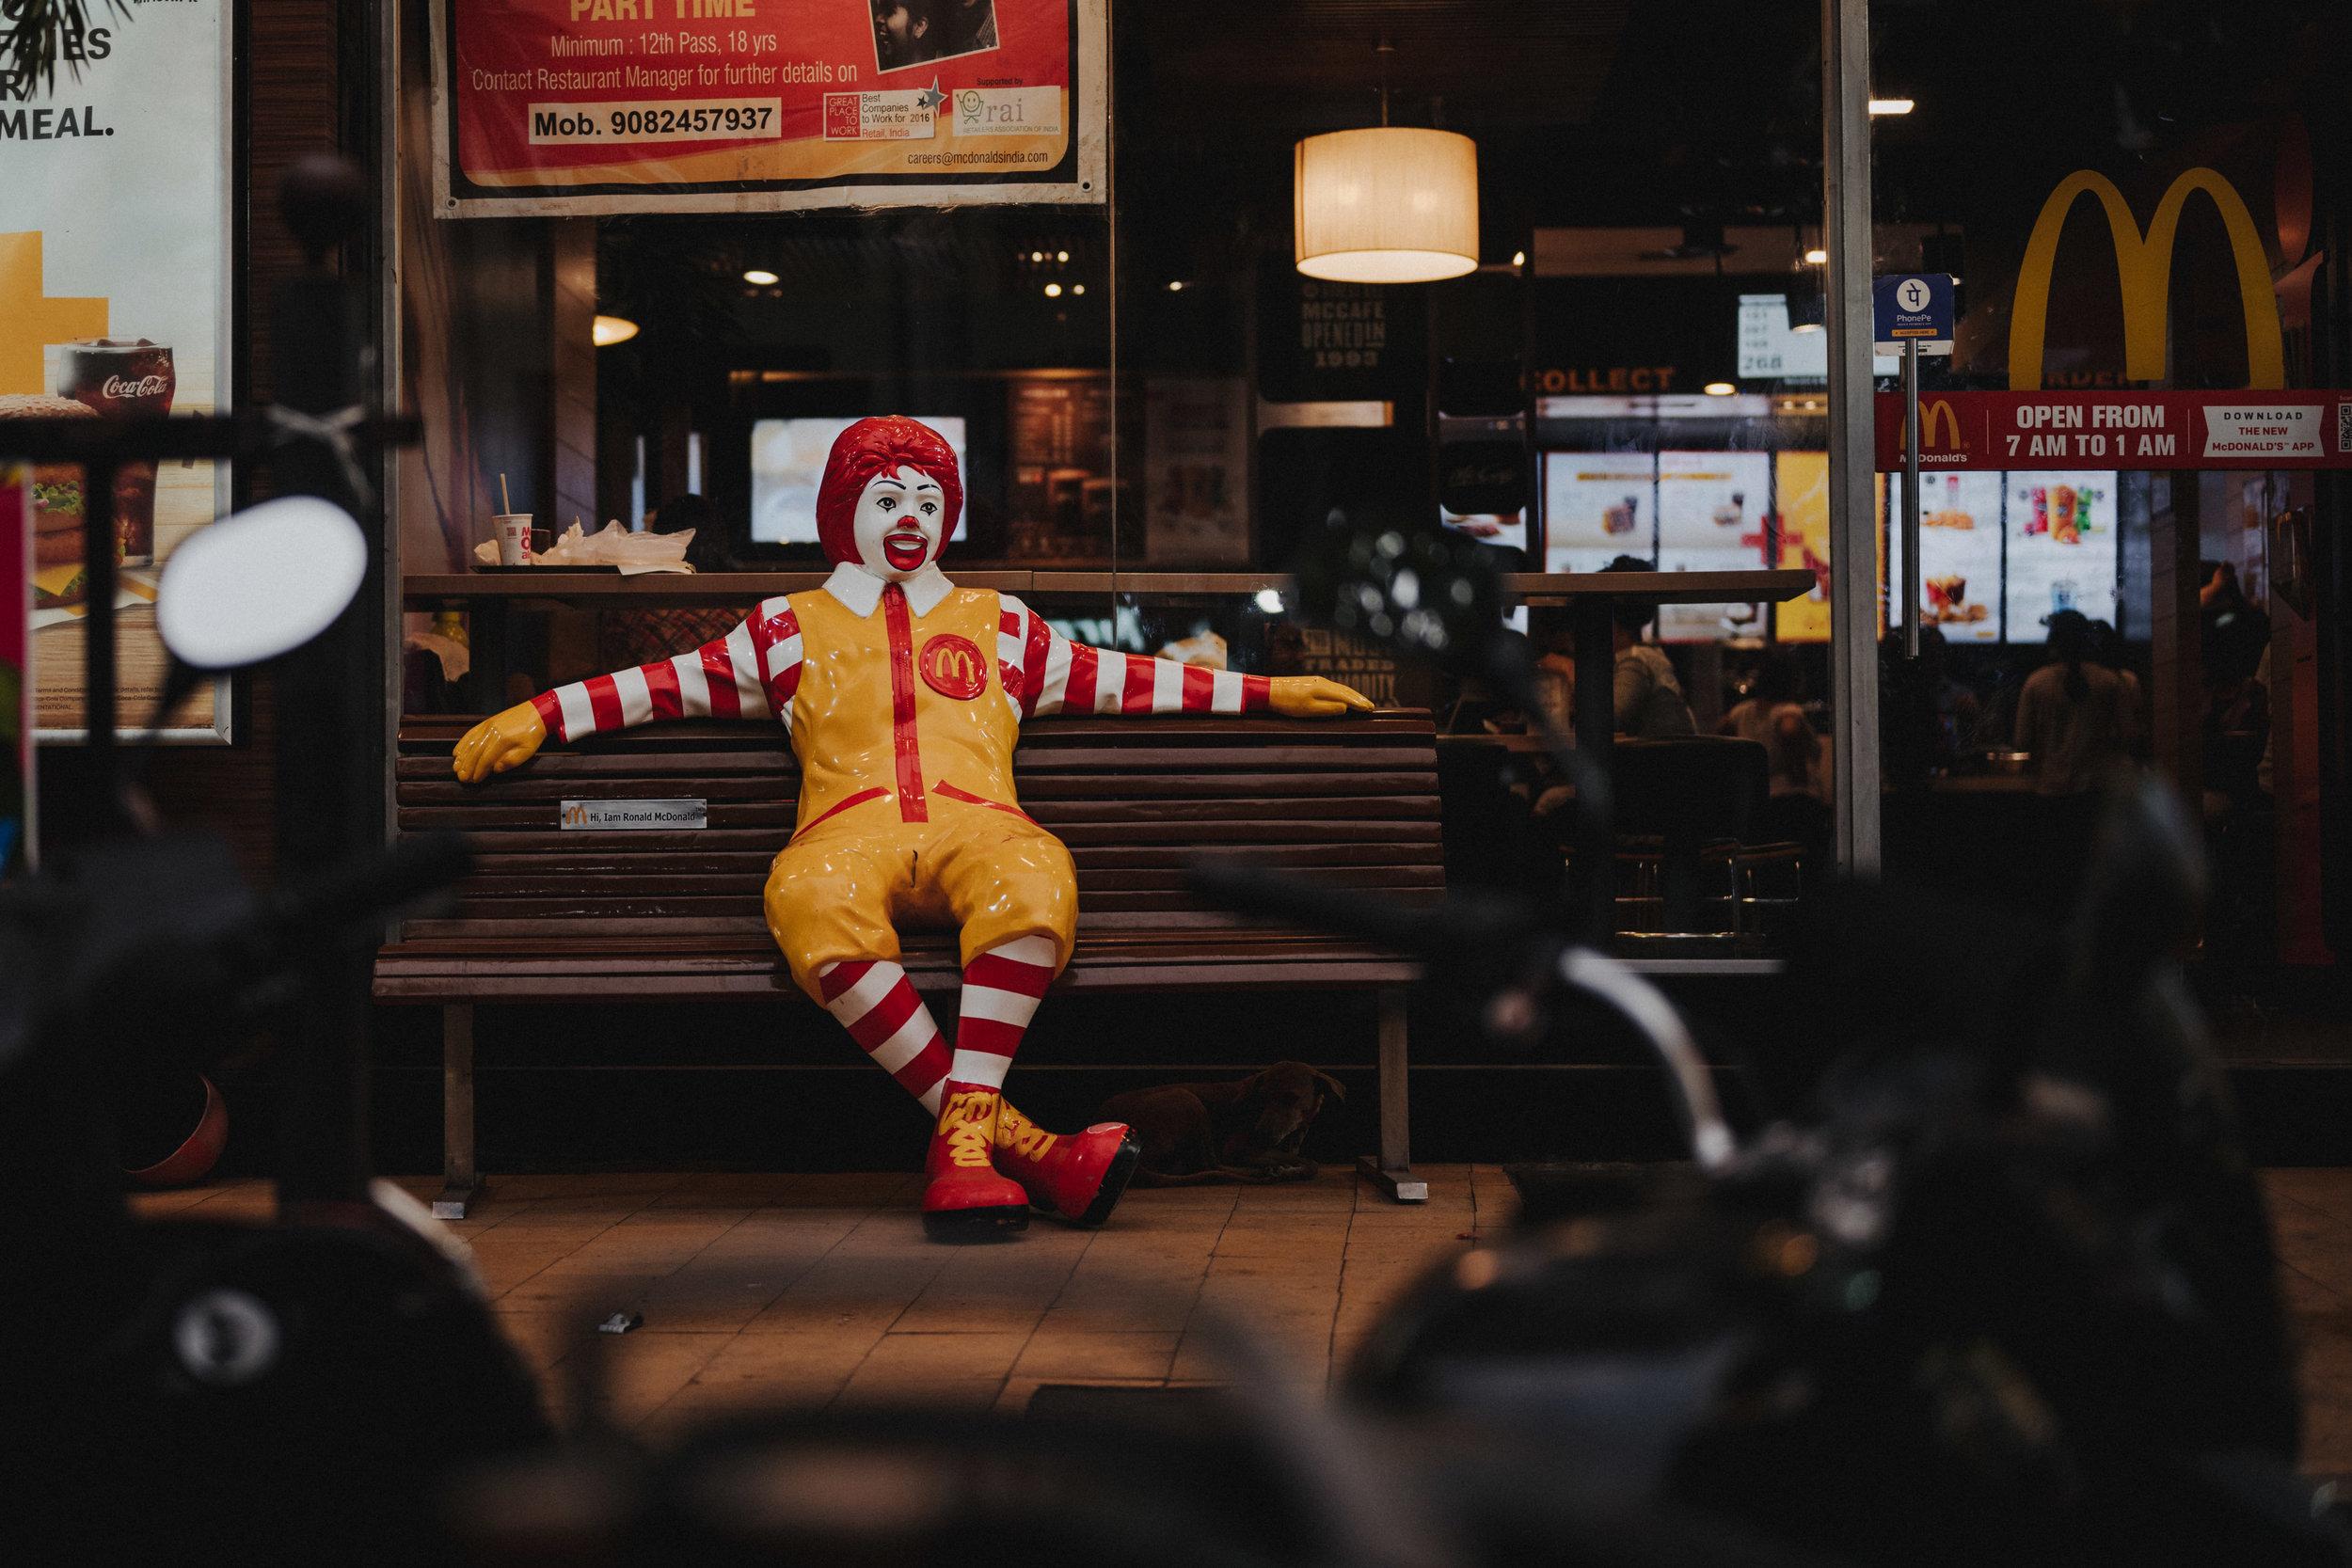 Fotoreportage Mumbai McDonalds in Indien